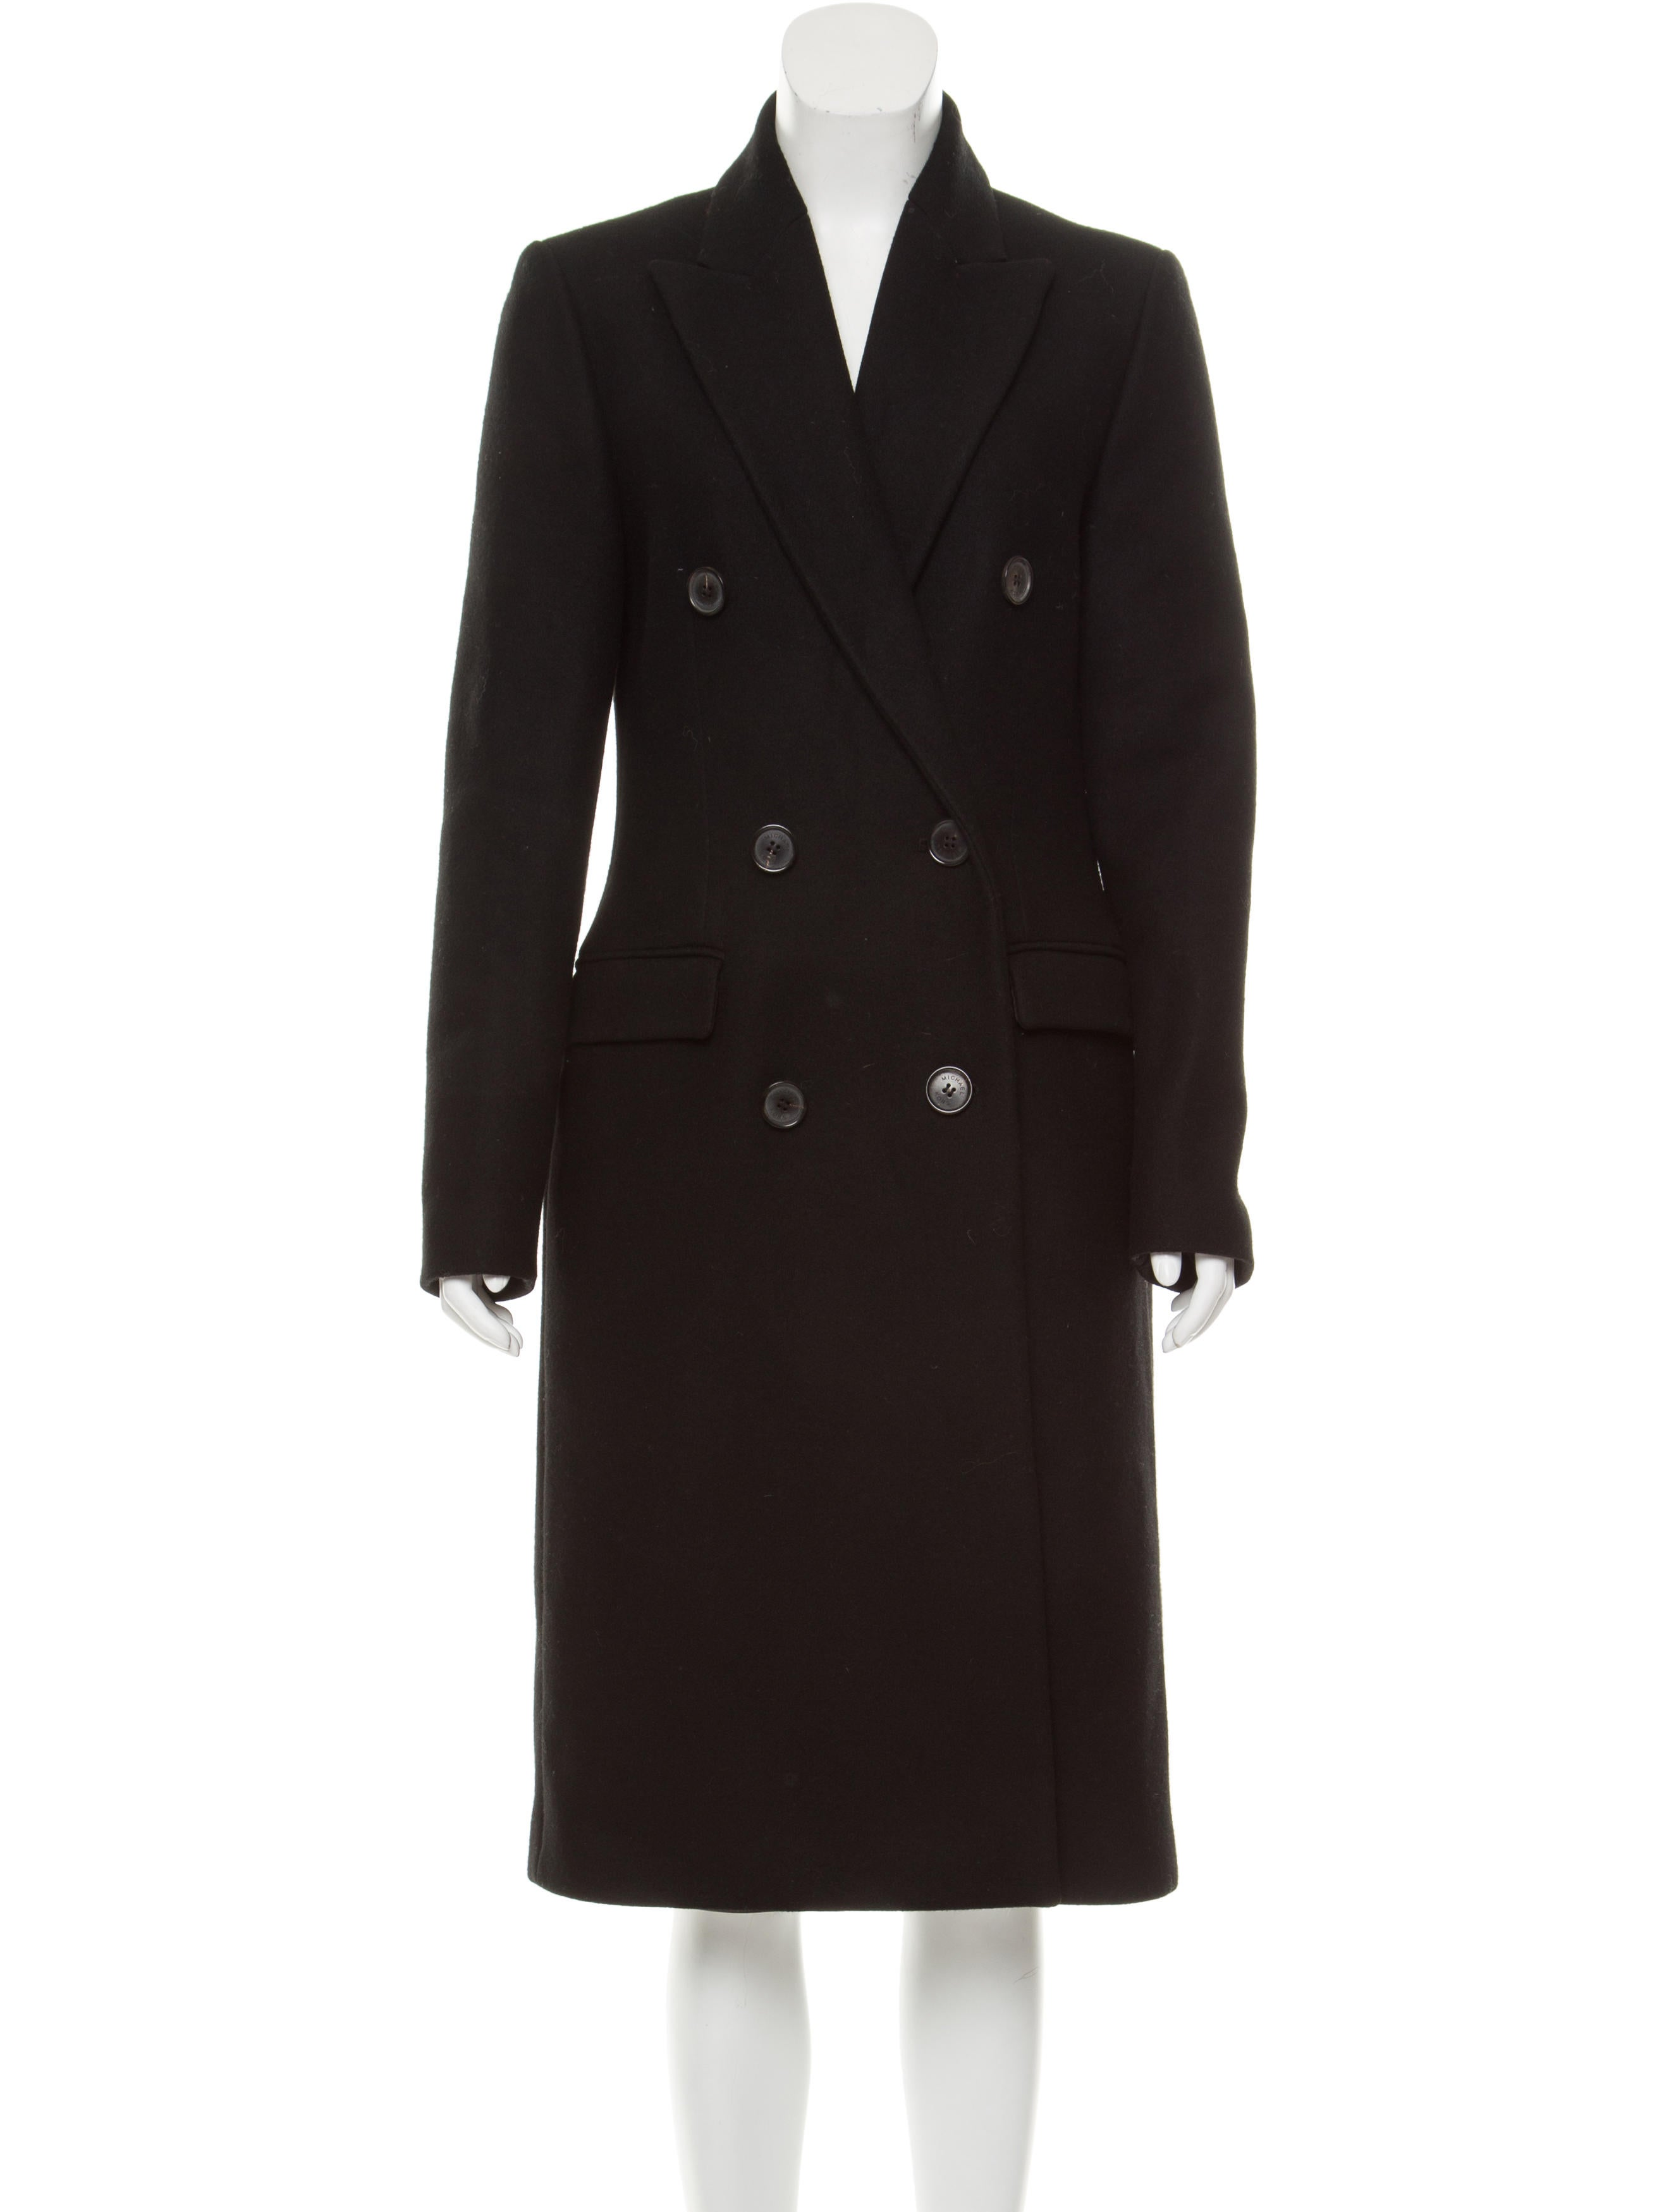 Related: wool coat men wool coat long wool overcoat cashmere coat wool coat women trench coat mens wool coat wool coat small j crew wool coat wool coat xl Include description Categories.